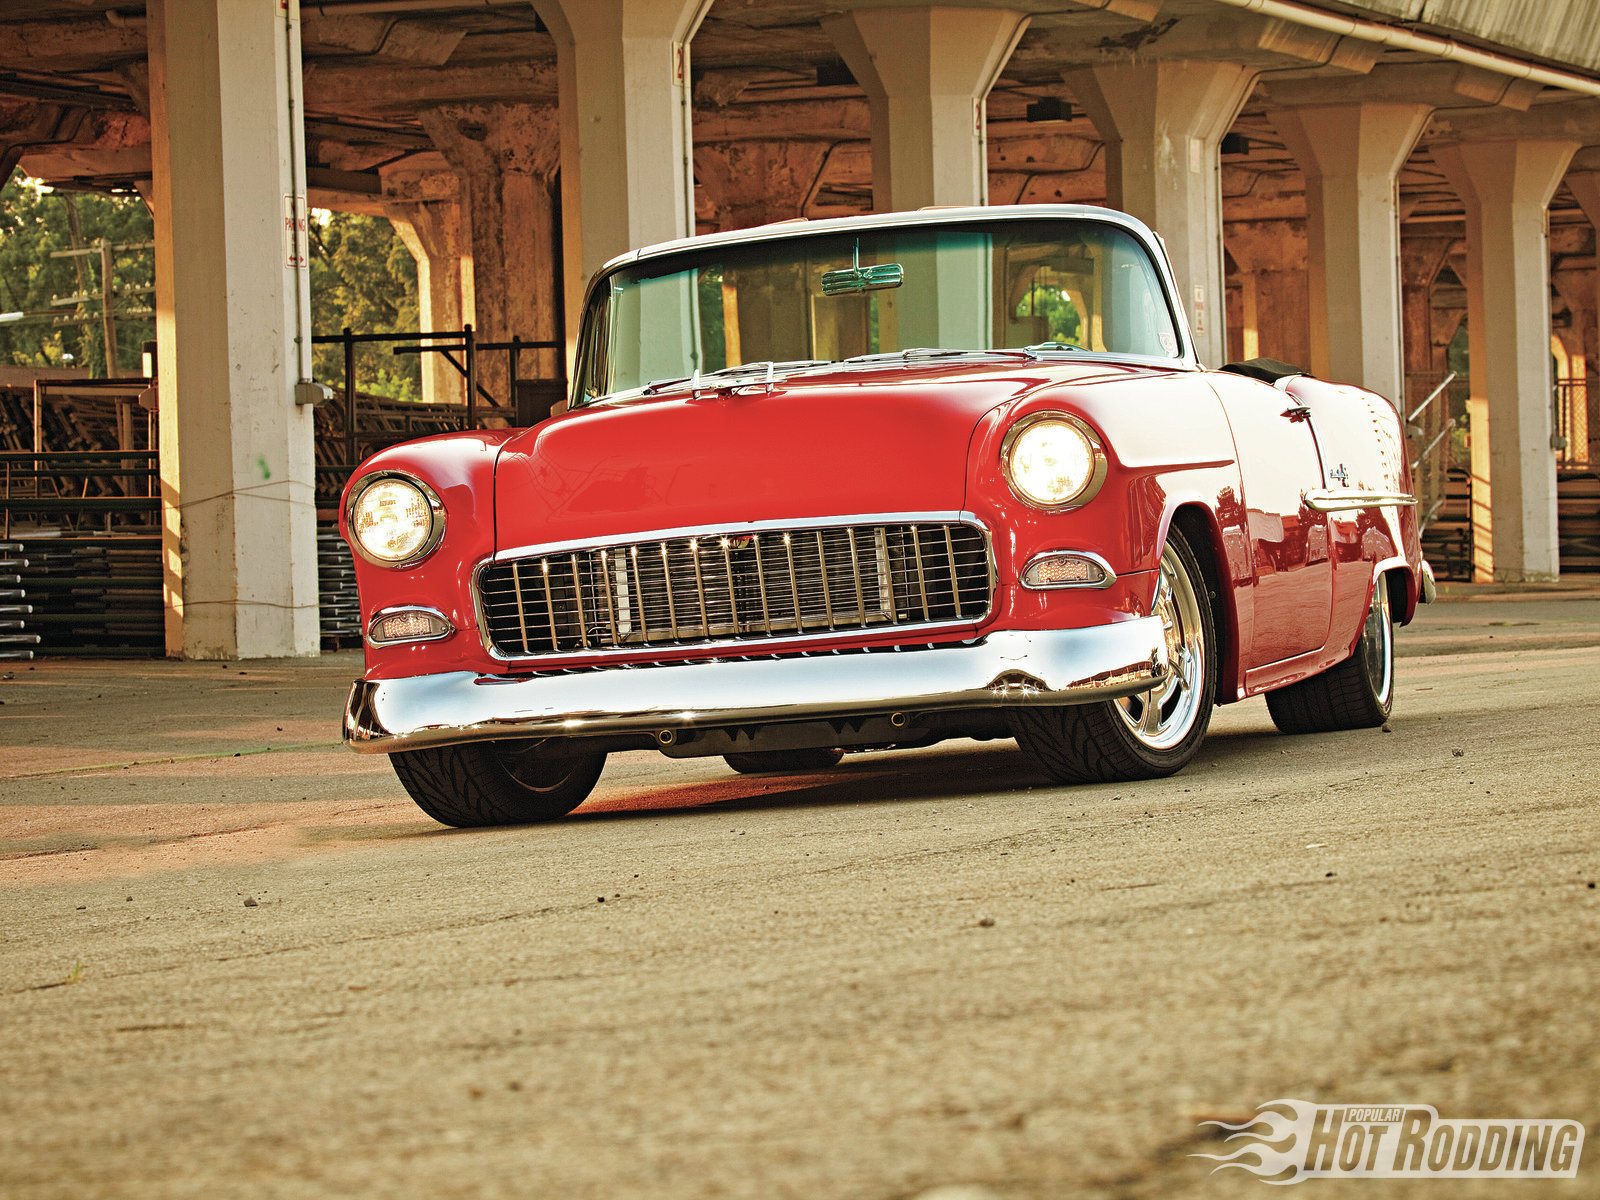 1955 Chevy Bel Air hot rods classic chevrolet wallpaper 1600x1200 1600x1200